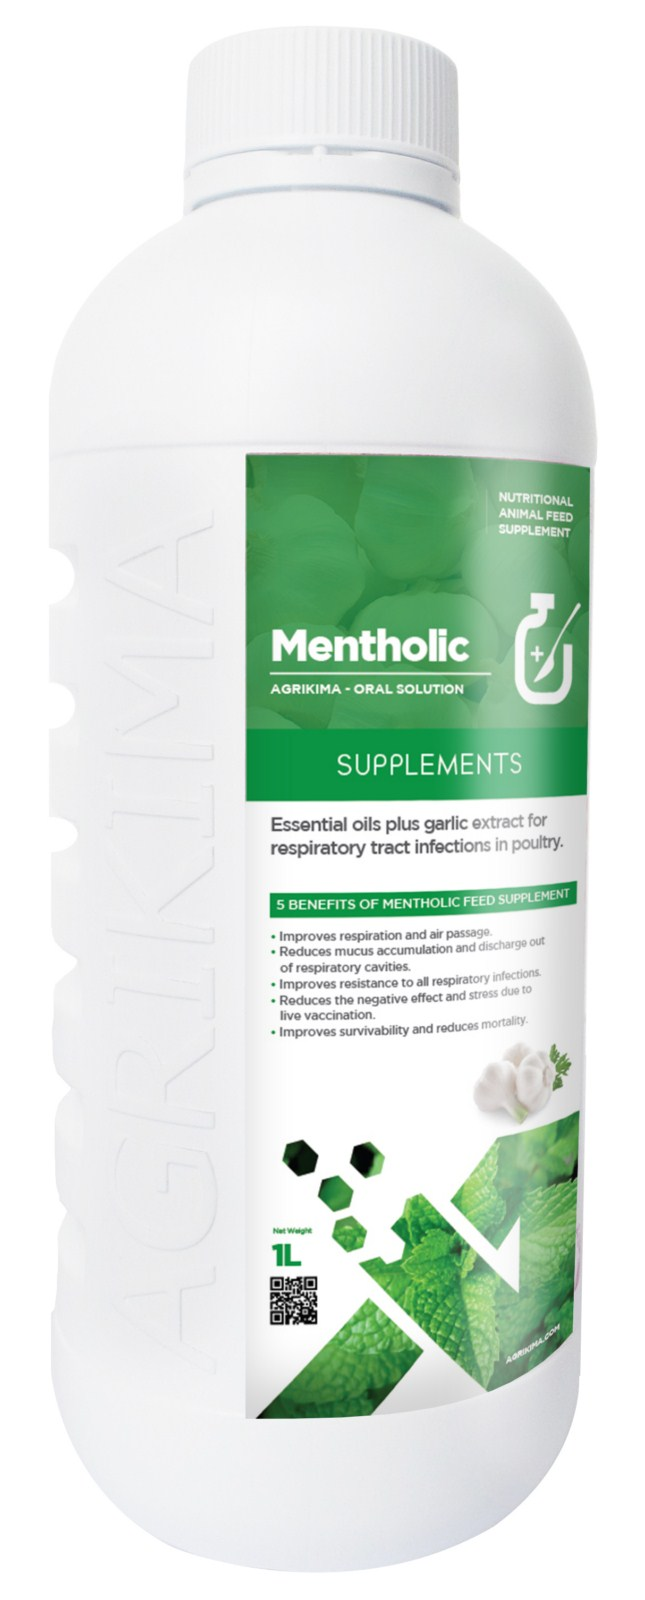 Mentholic-menthol-ecluptus oil-garlic extract